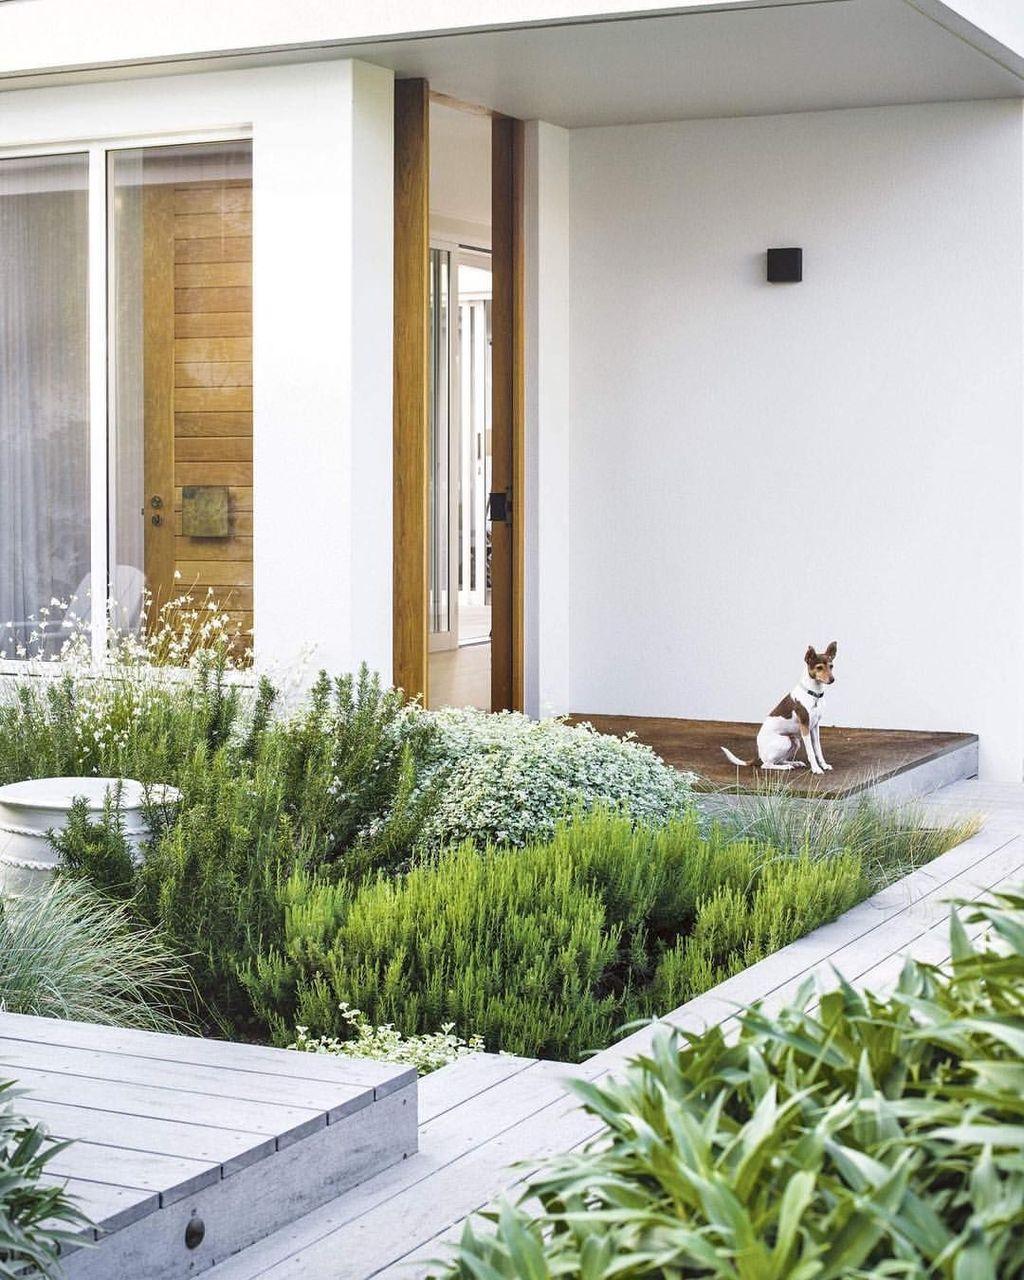 The Best Urban Garden Design Ideas For Your Backyard 28